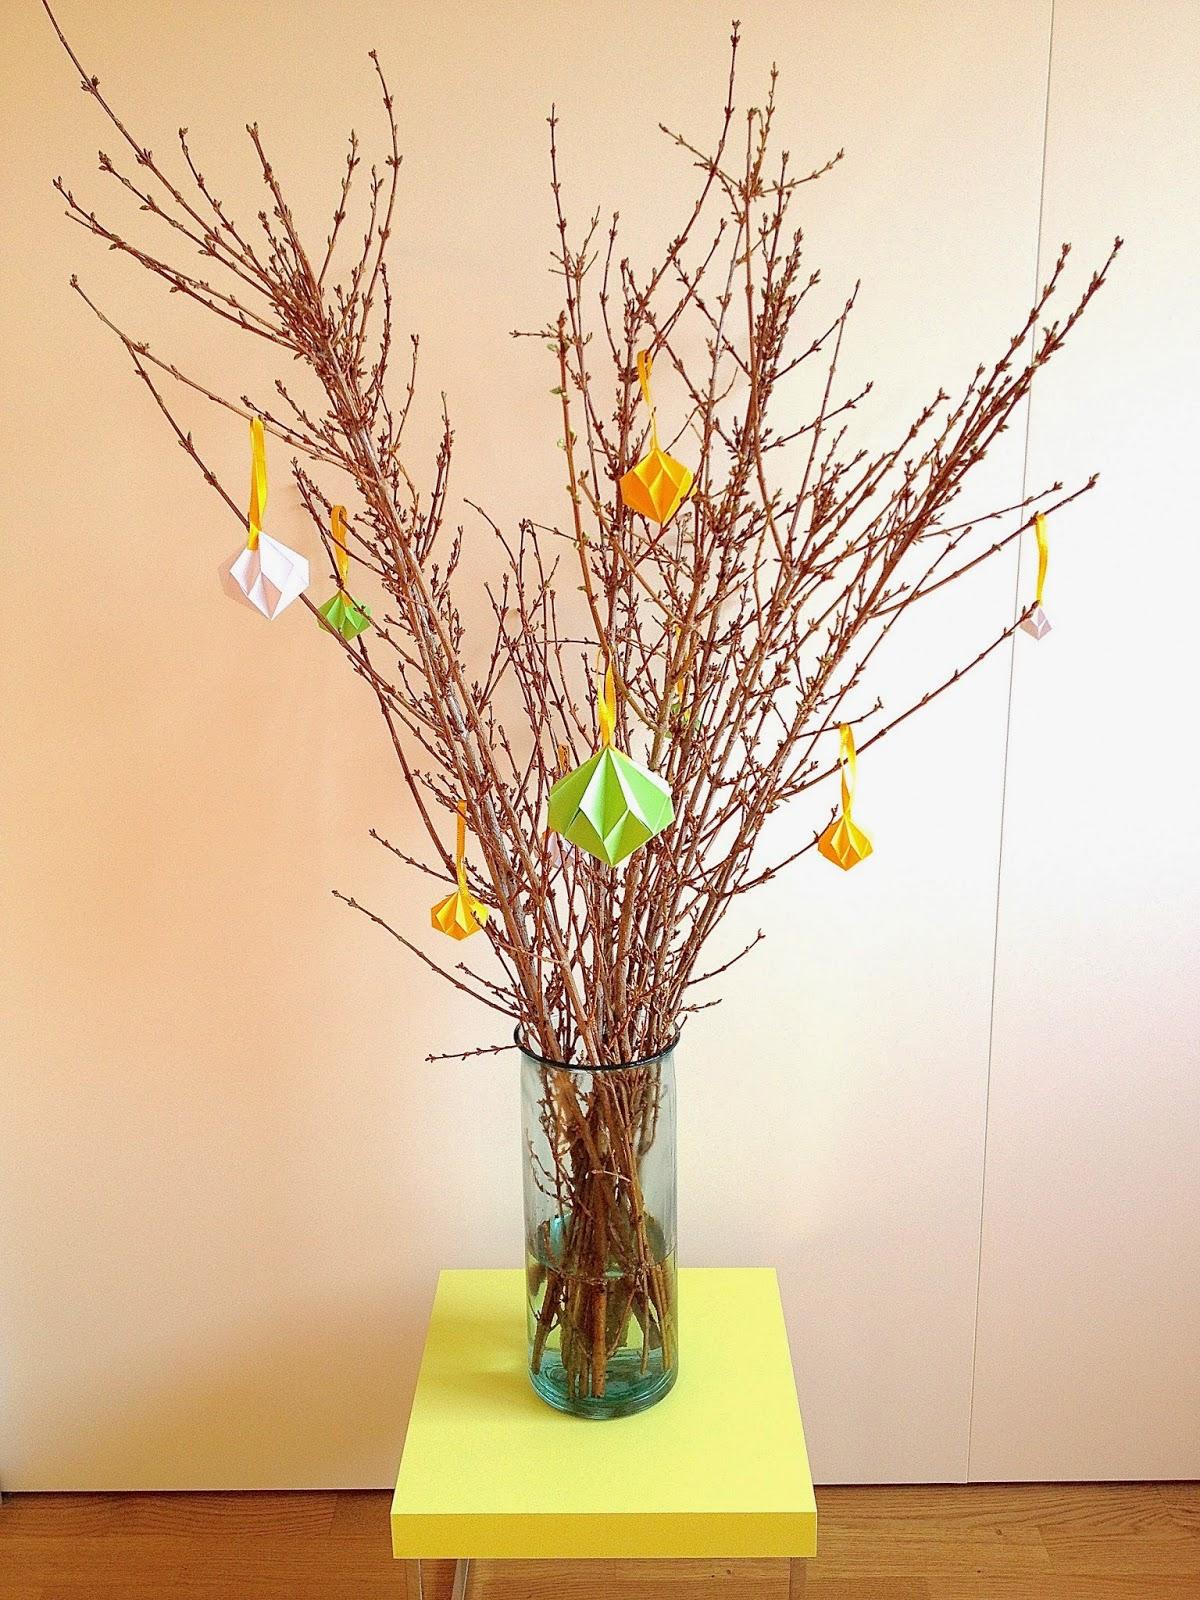 Arbre de p ques avec diamants en origami diy easter tree with origami diamonds - Arbre de noel origami ...